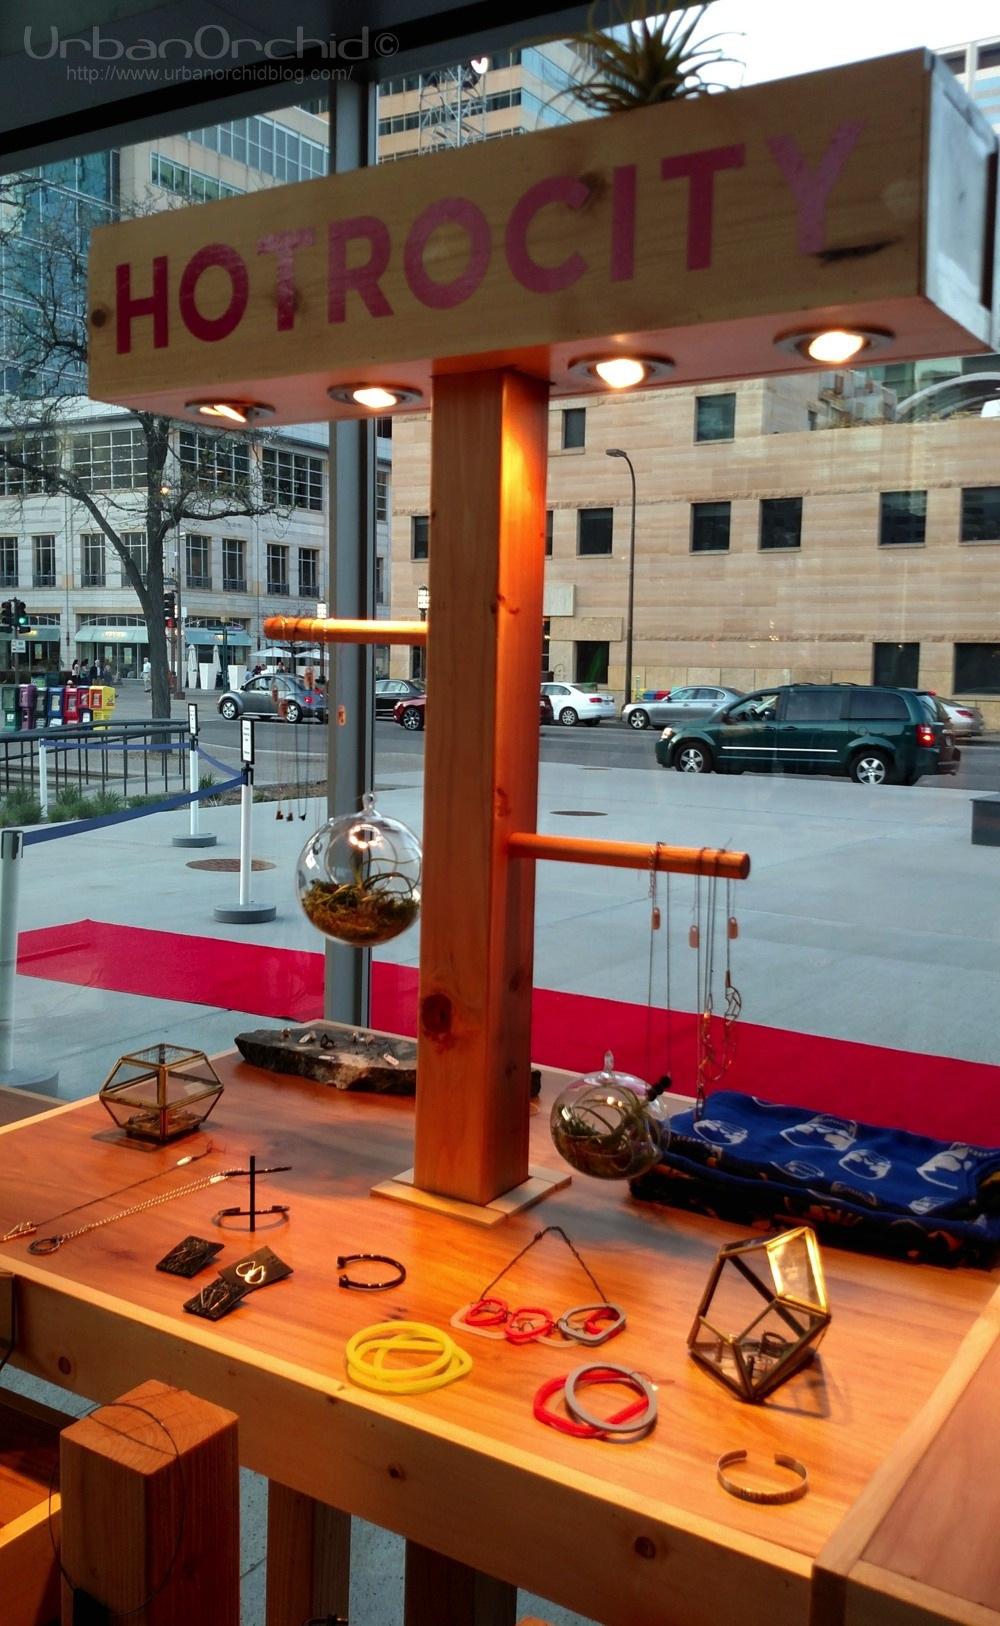 Hotrocity pop-up shop at Envision Spring 2015.